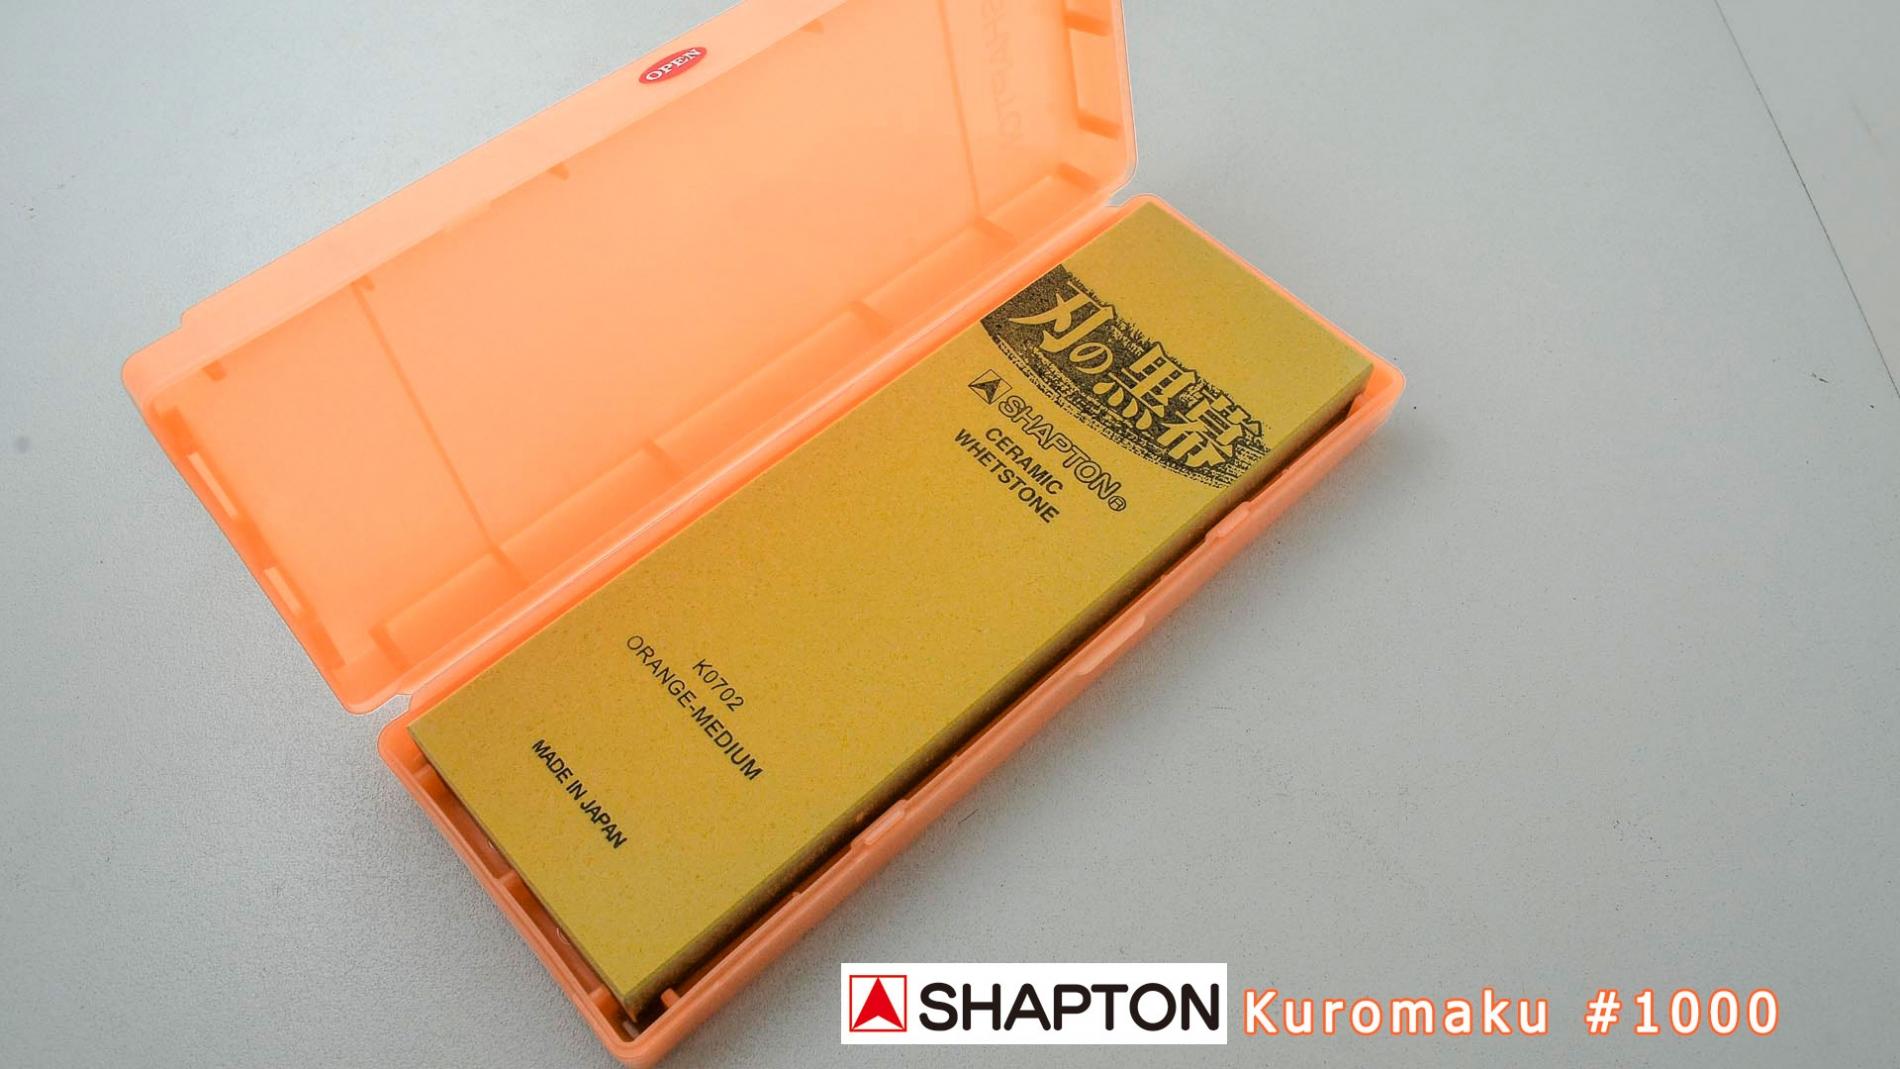 K0702-Piedra de afilar 1000 Shapton Kuromaku K0702-max-6.